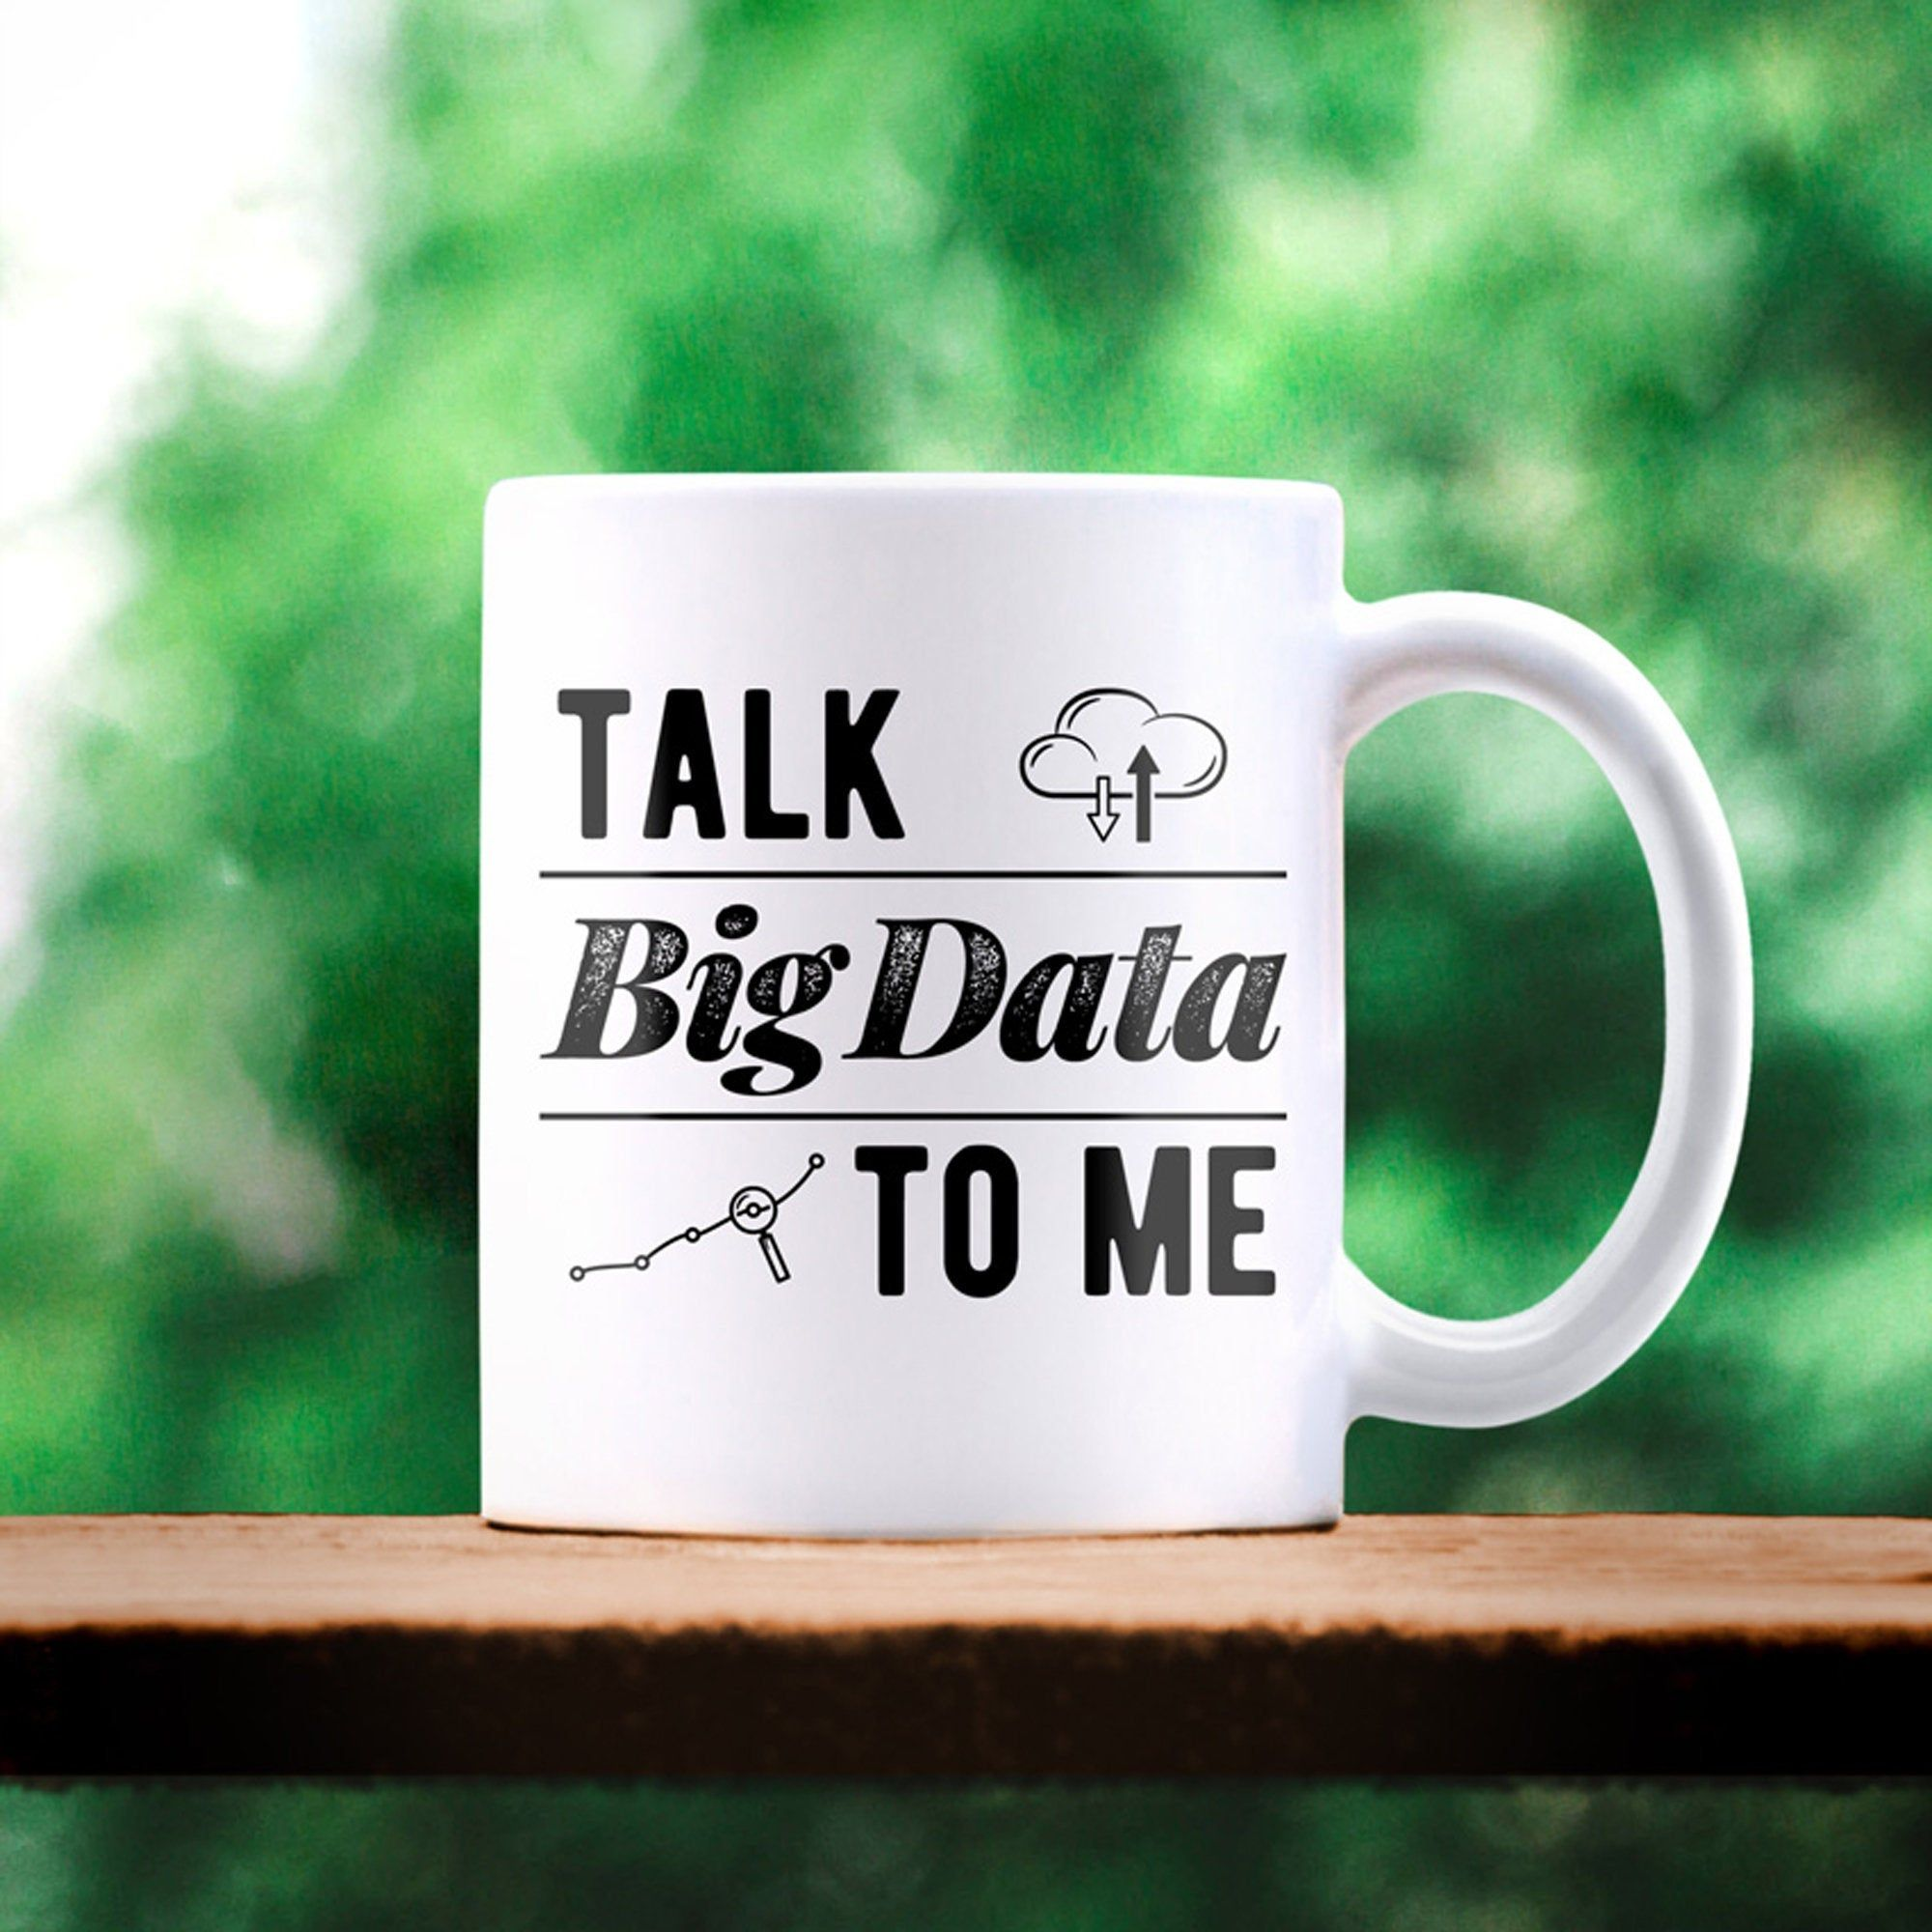 Big data mug data geek tech gift computer science talk